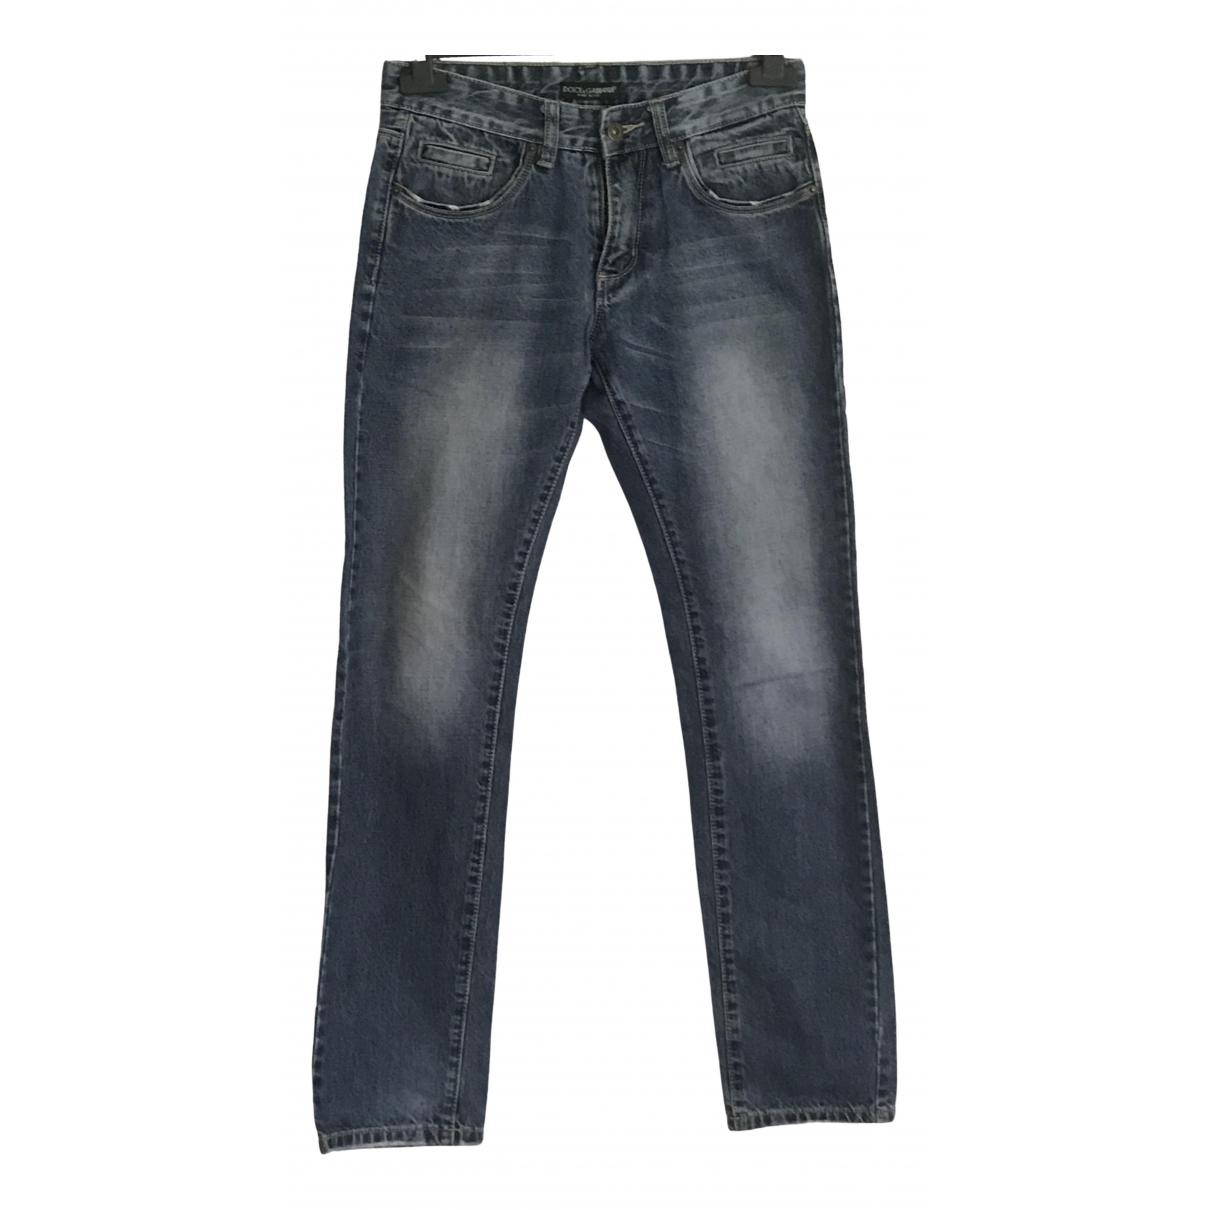 Dolce & Gabbana \N Blue Denim - Jeans Trousers for Women 10 UK